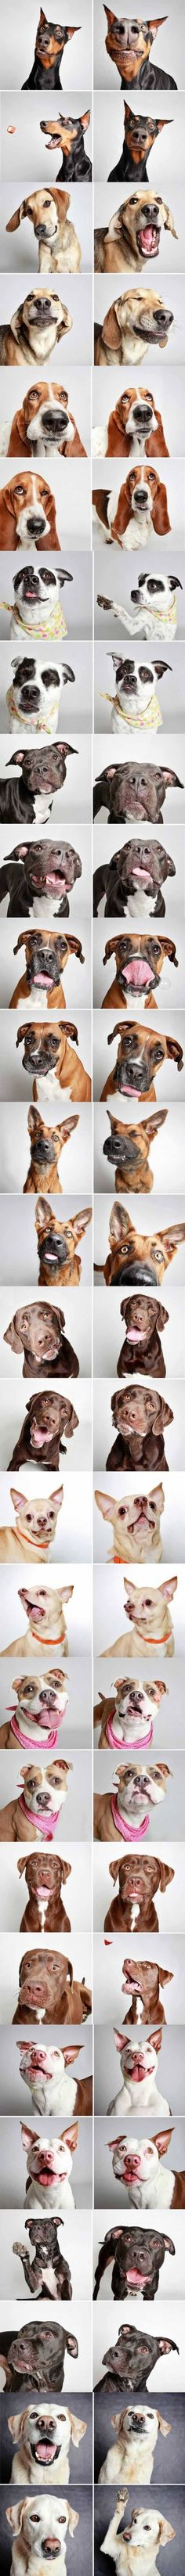 Dog Self-Portraits